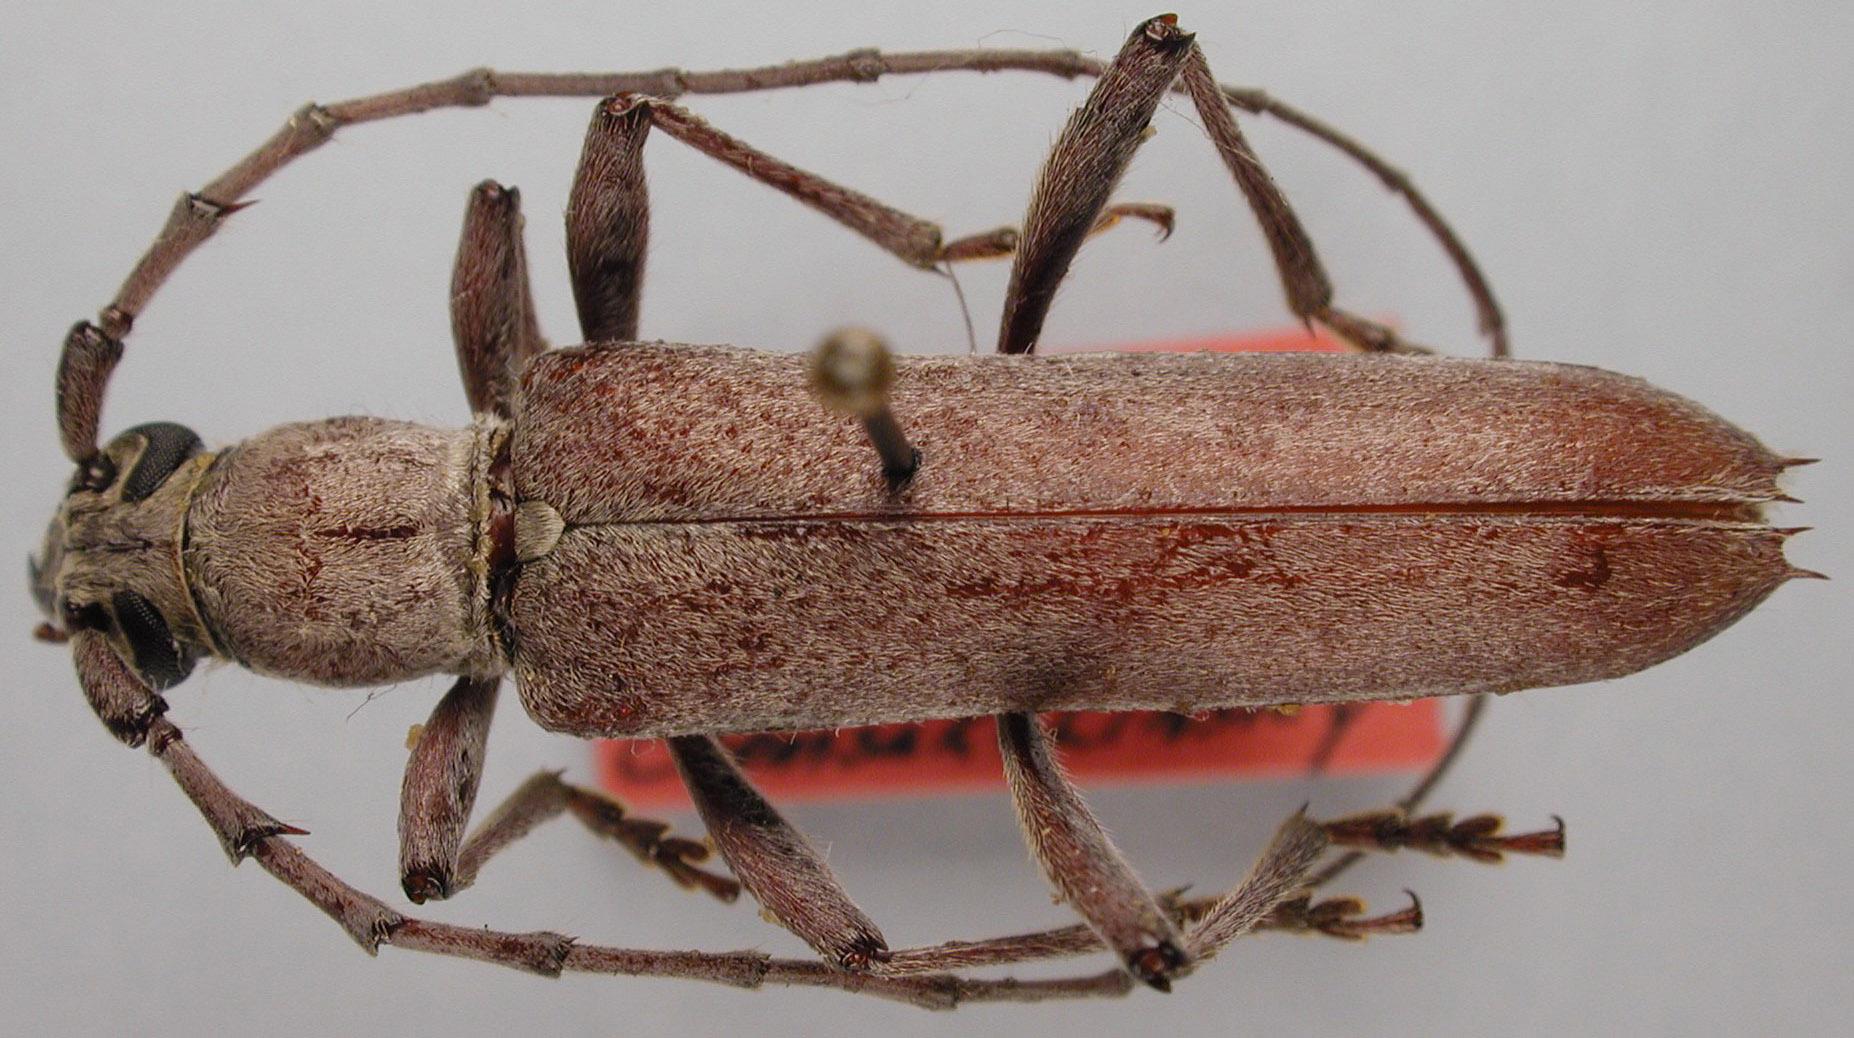 Aneflus sericatus image